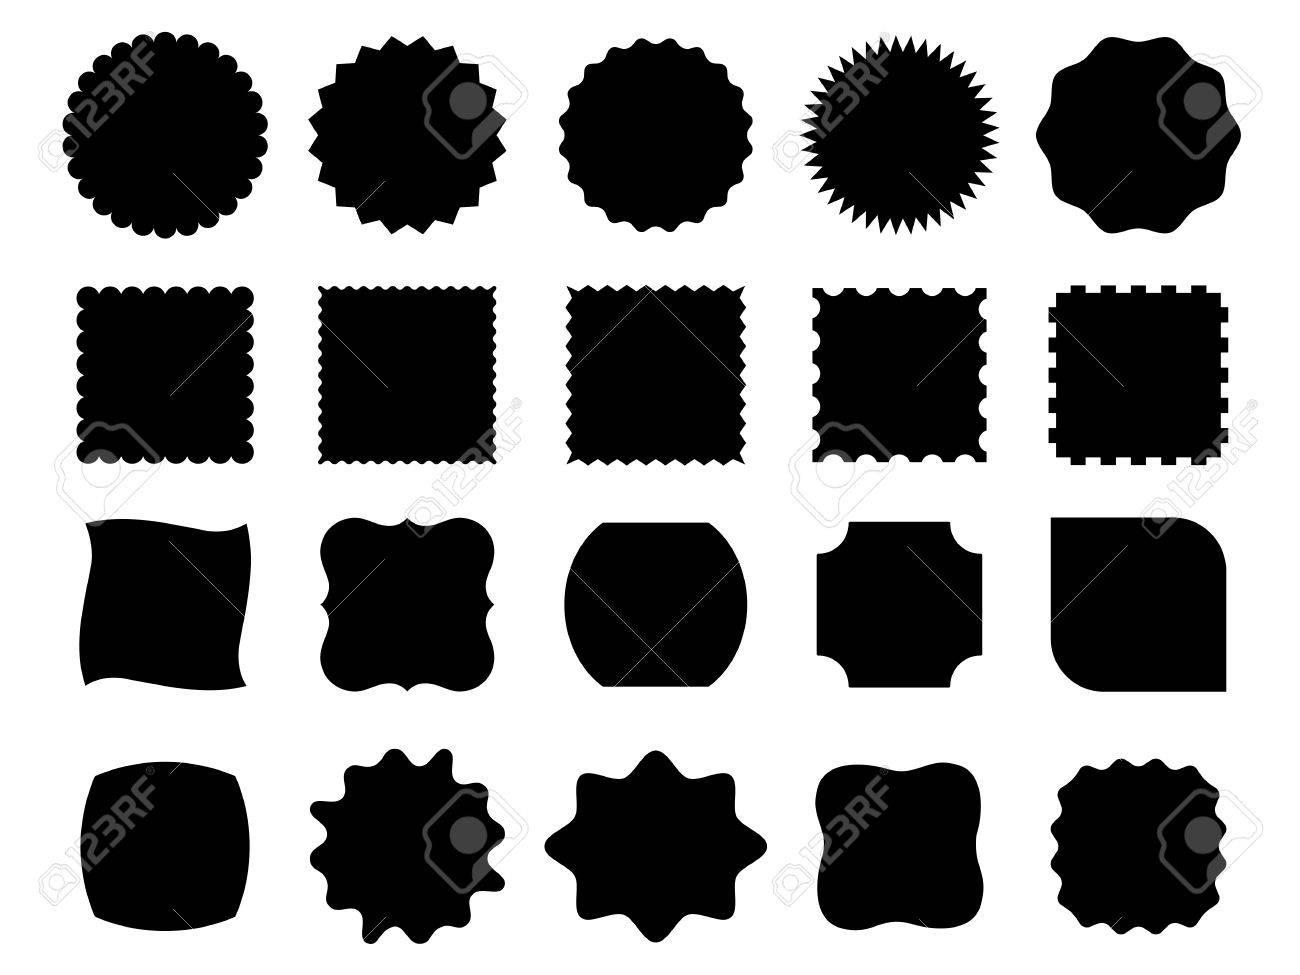 Black vector shapes - 61790300